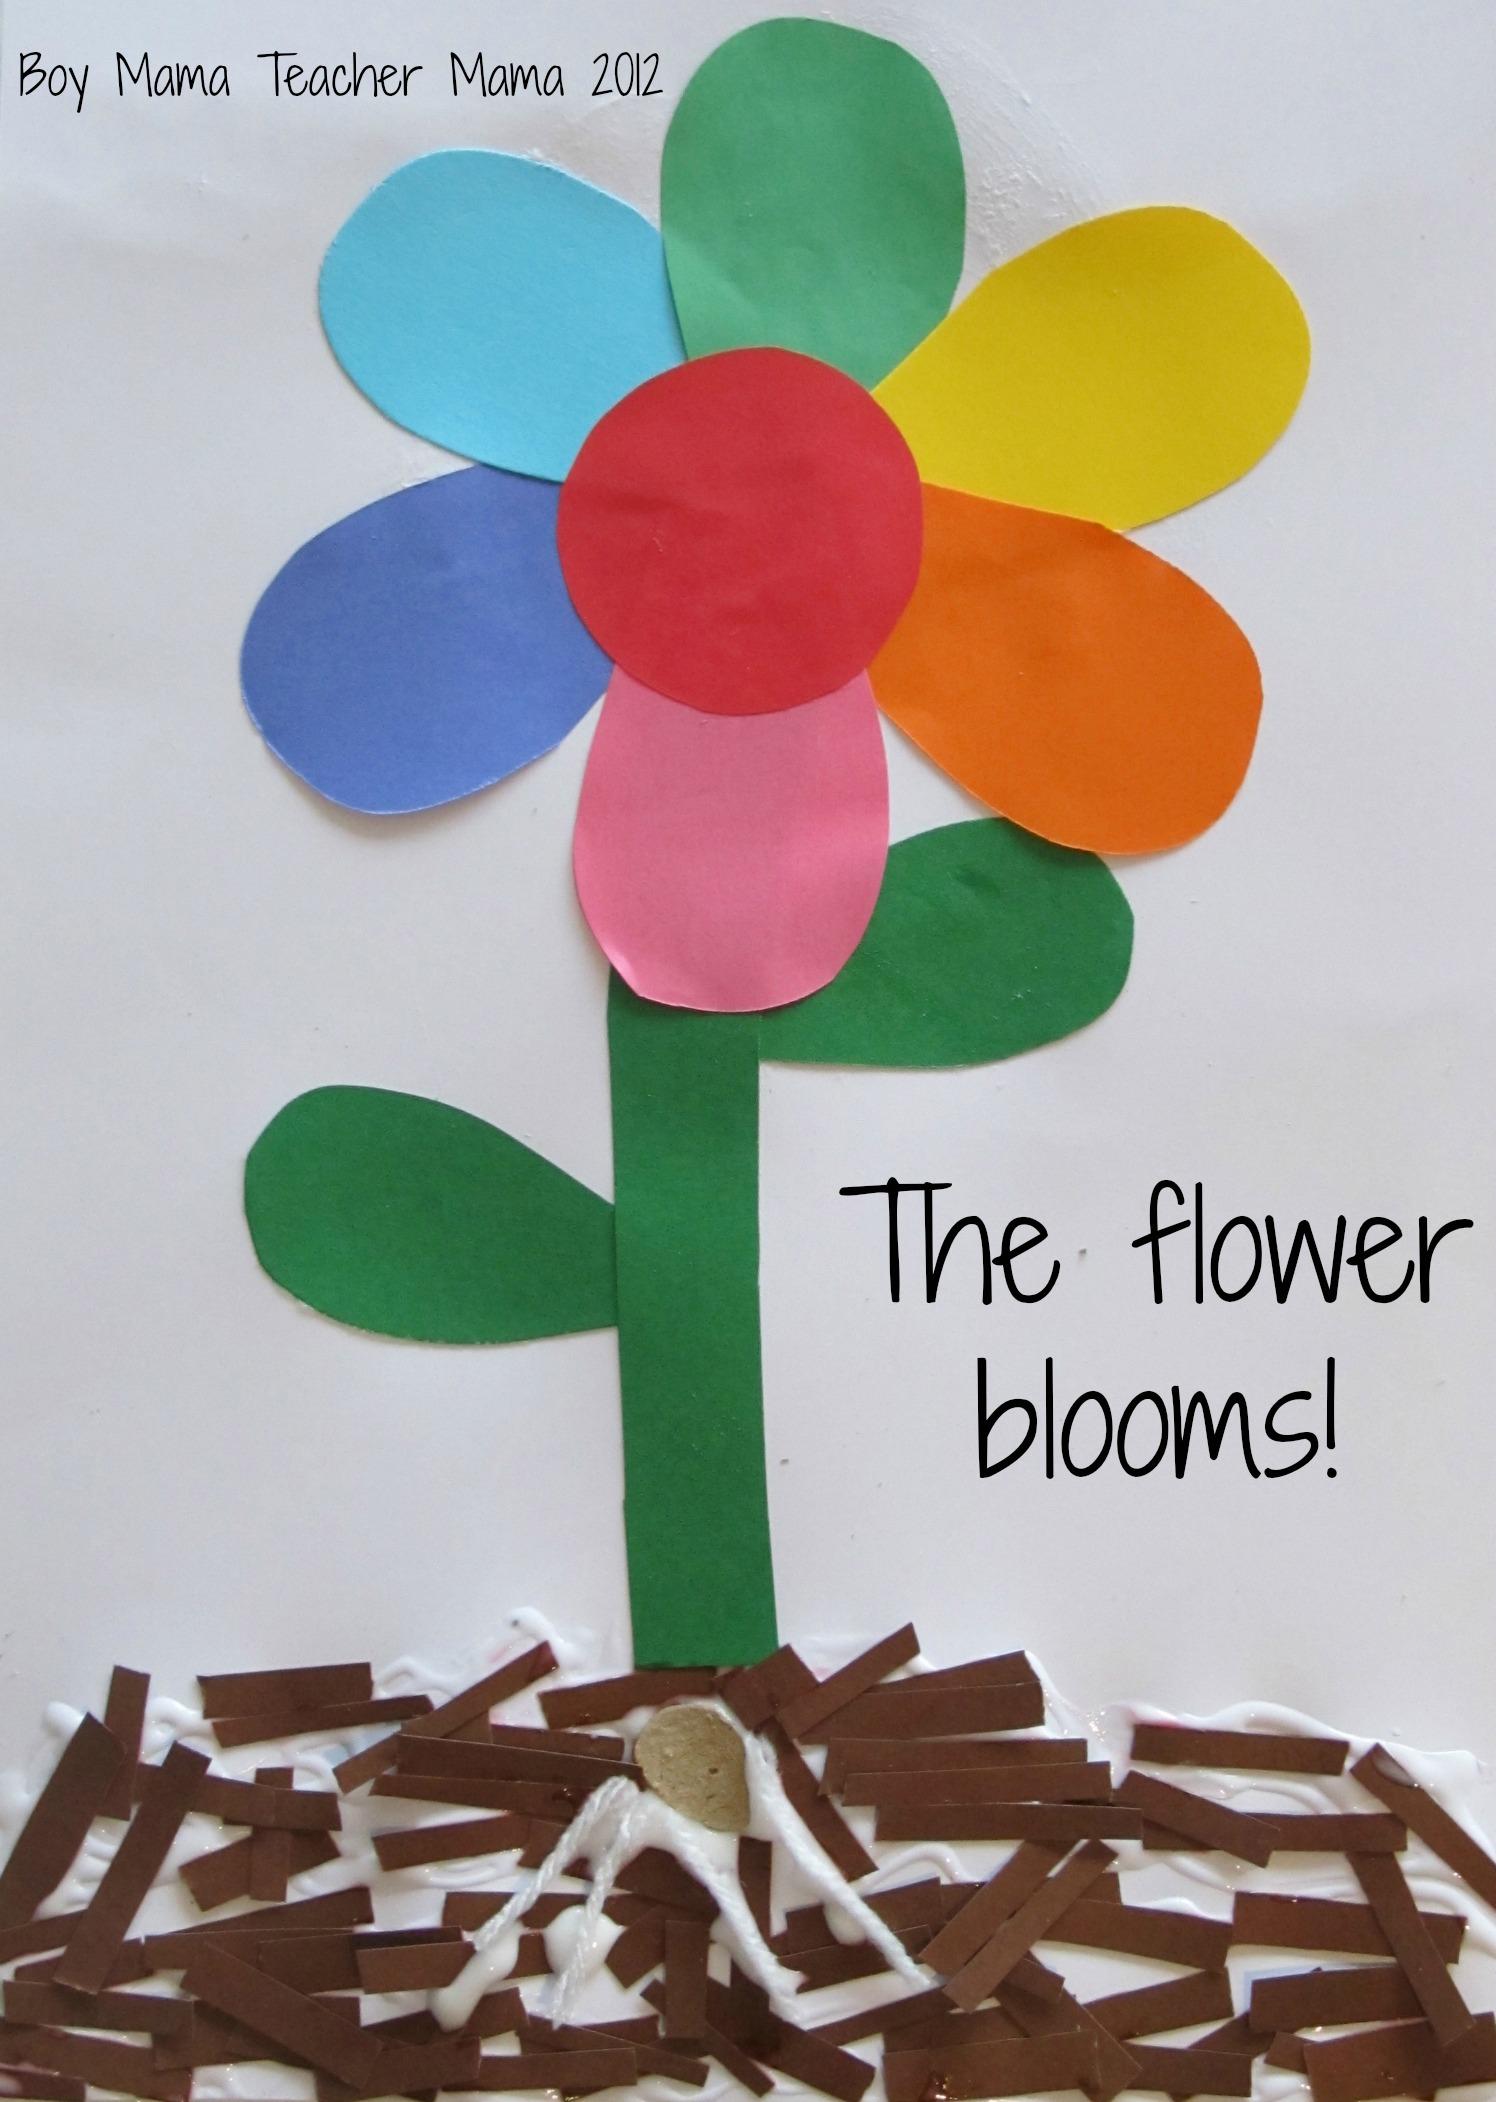 Book Mama Planting A Rainbow By Lois Ehlert